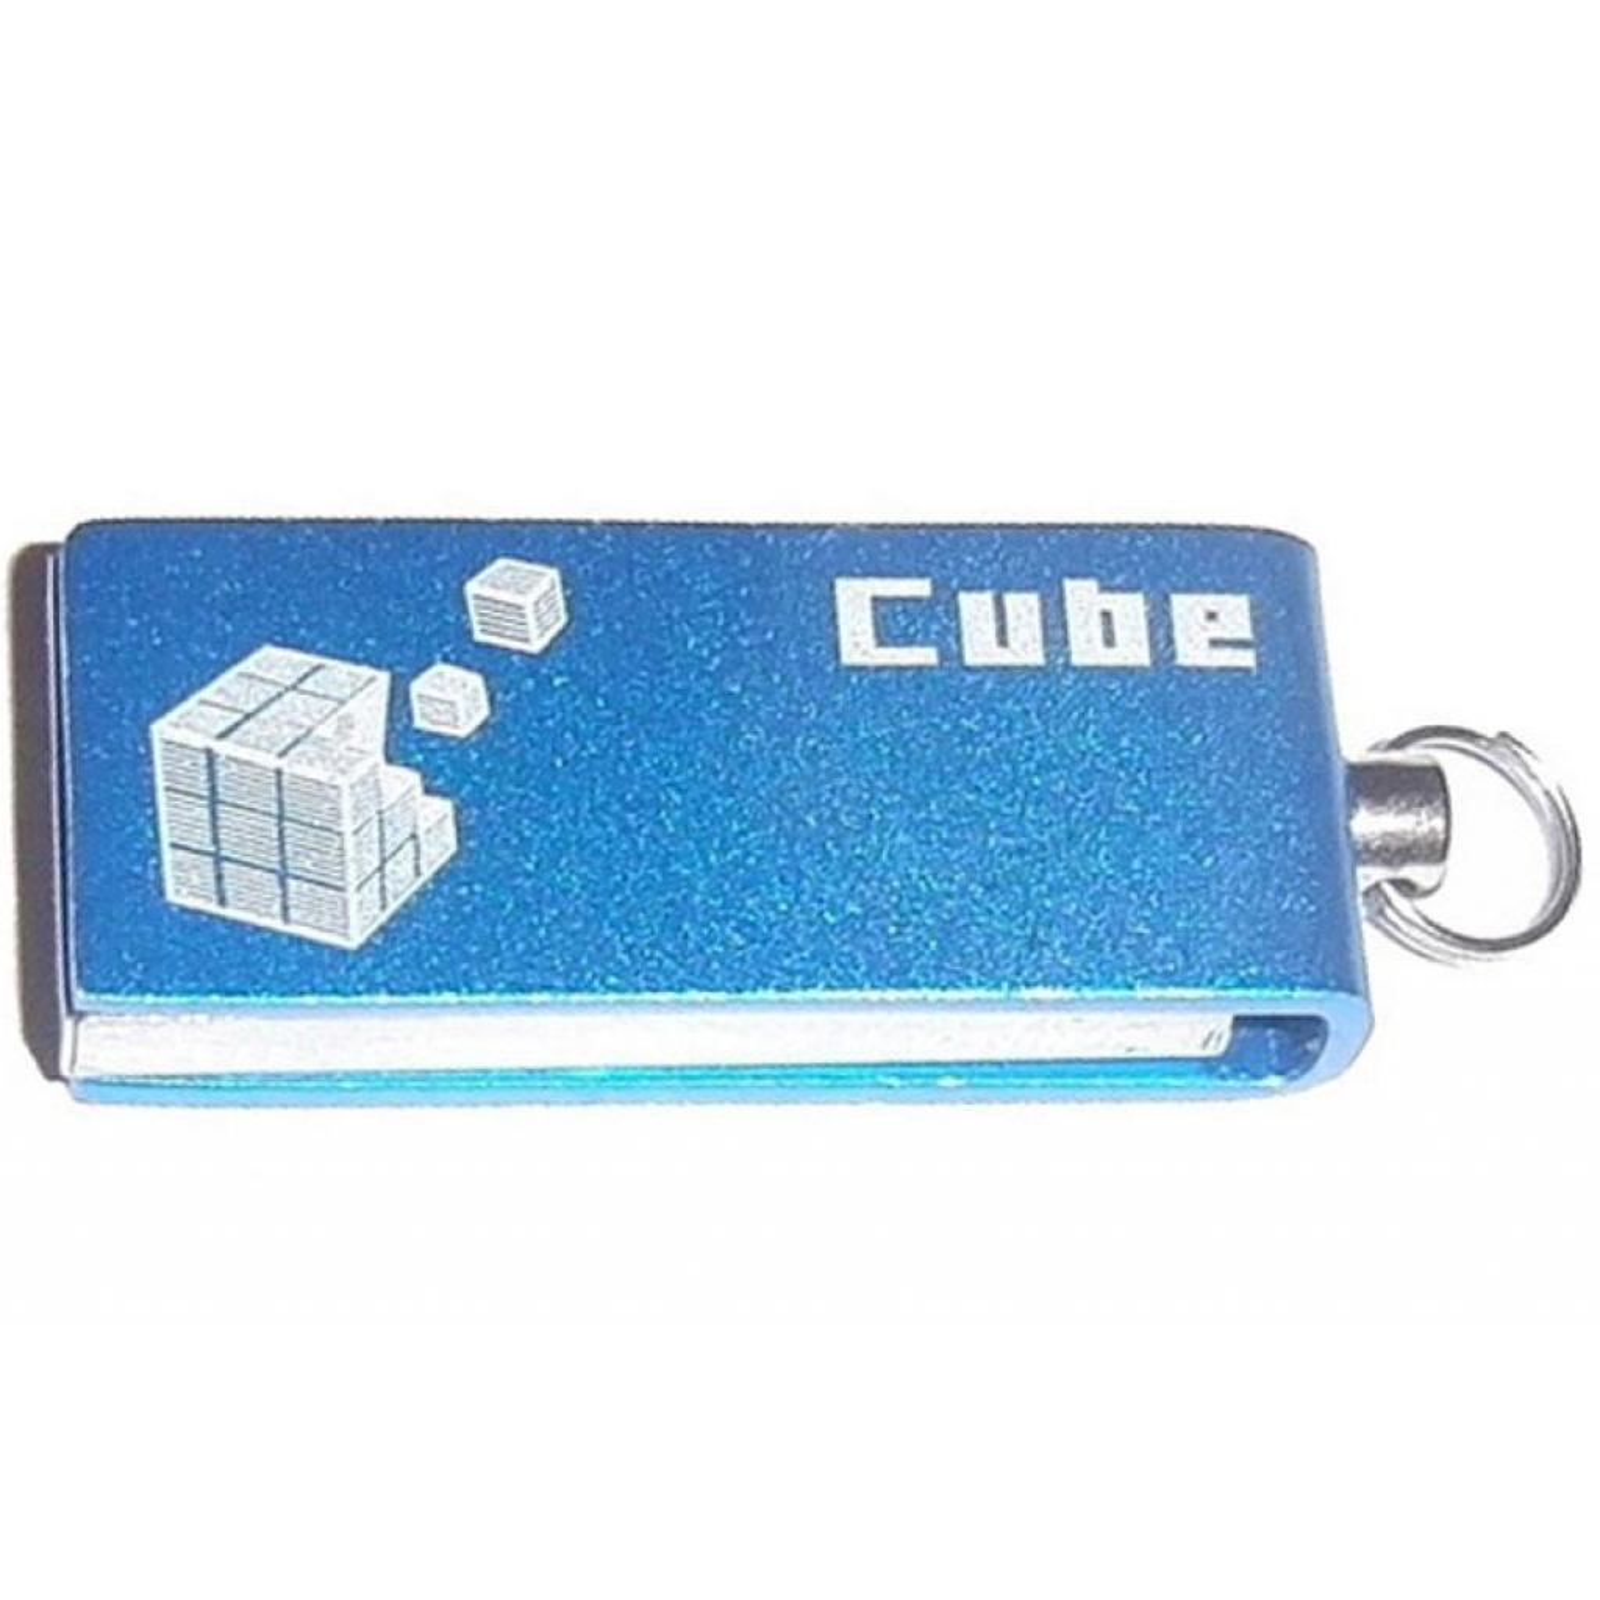 USB флеш накопитель Goodram 32GB Cube Silver USB 2.0 (PD32GH2GRCUSR9)